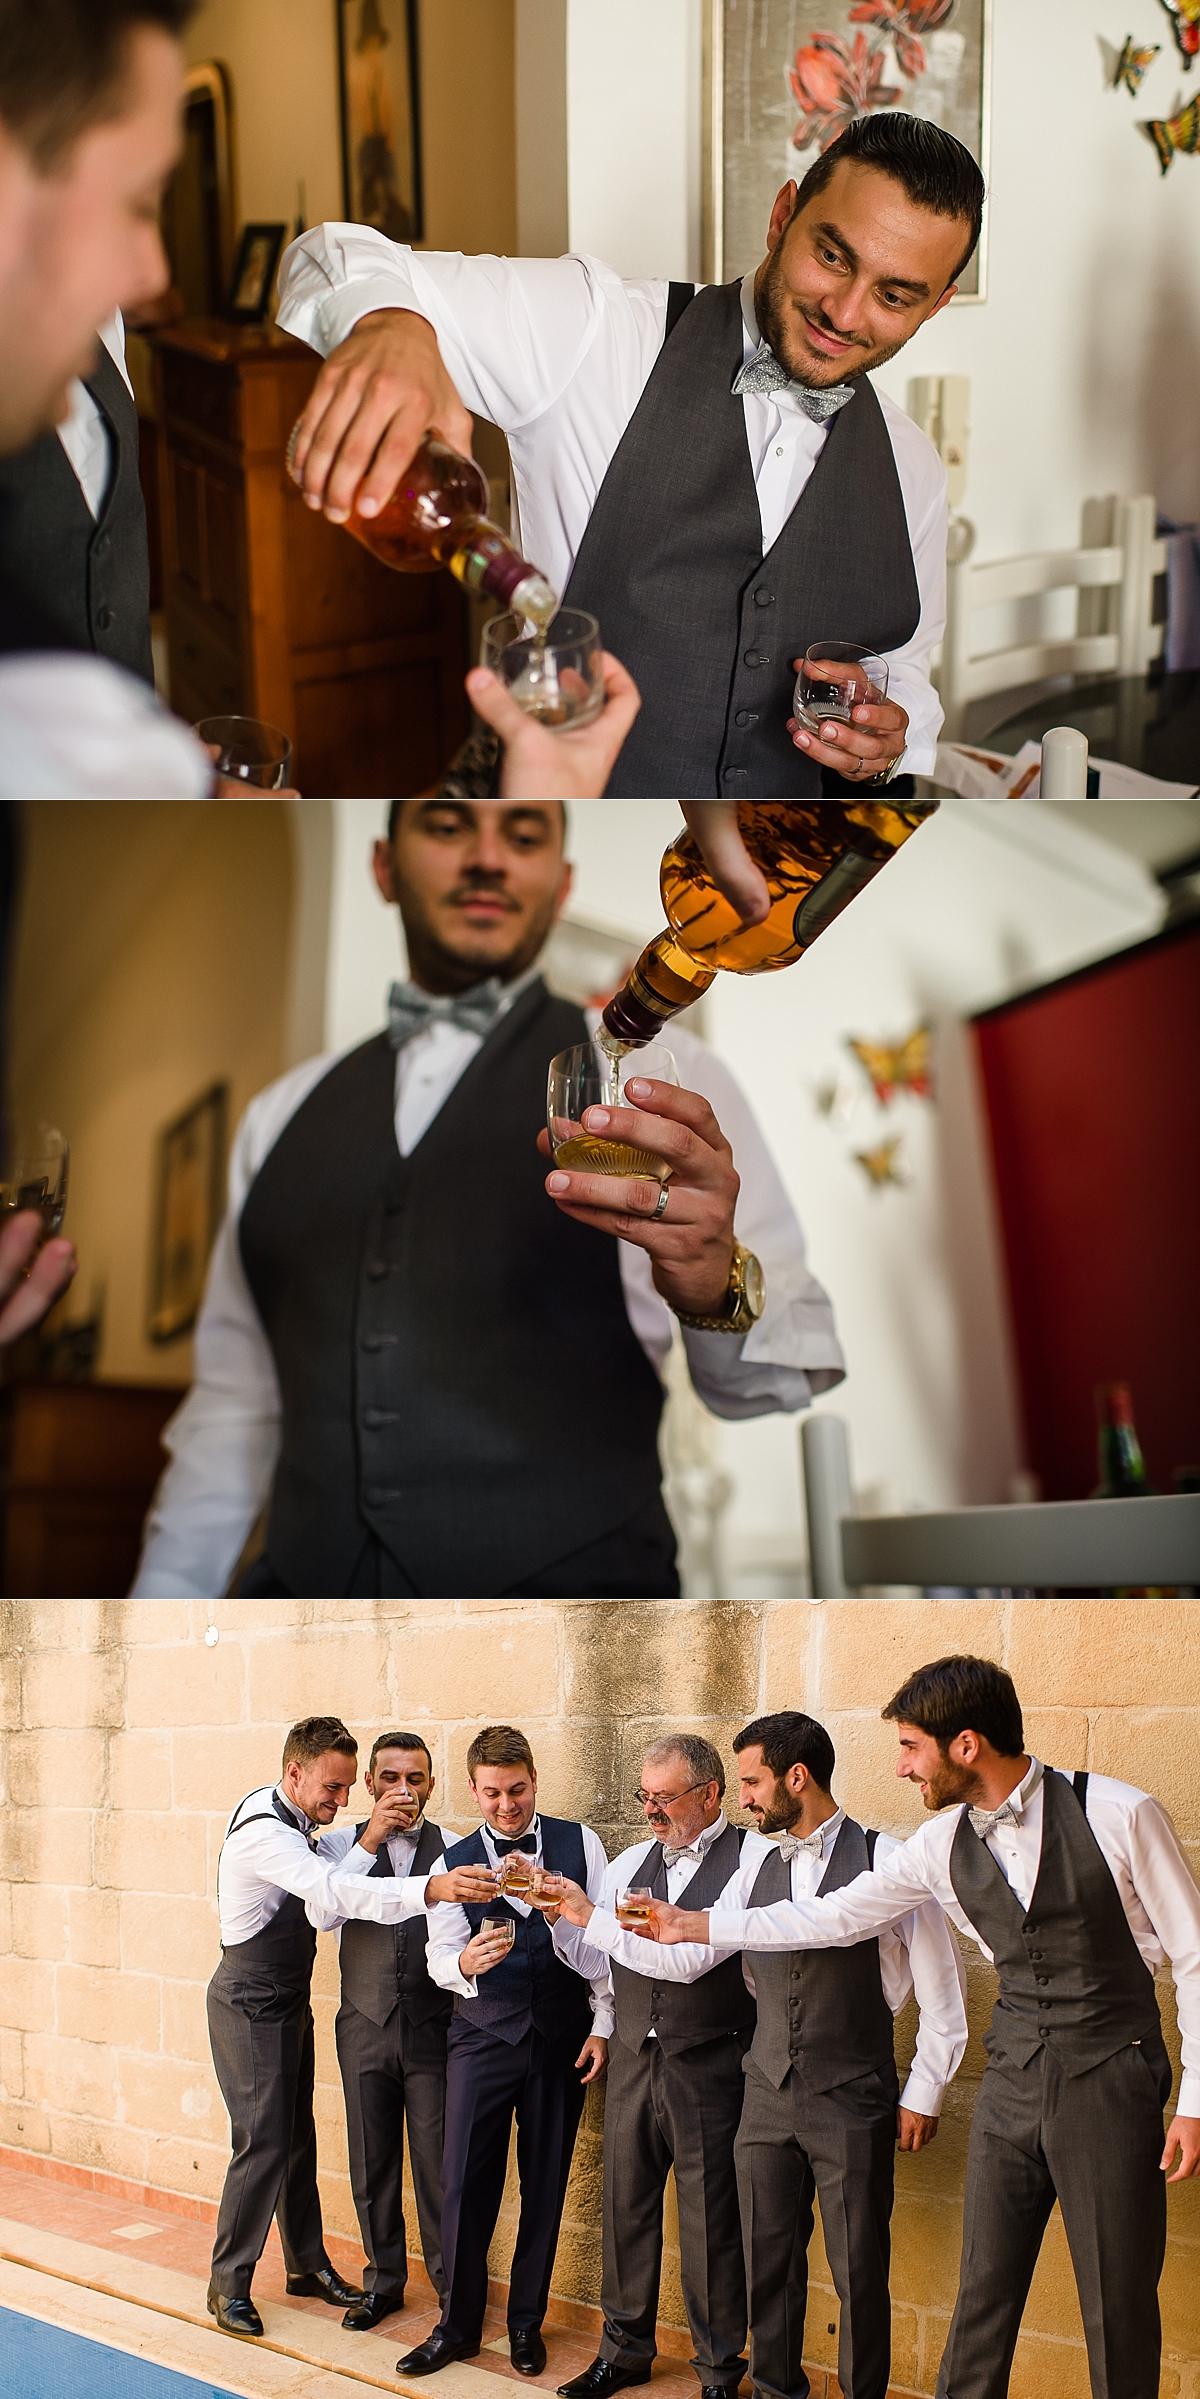 Adreana & Andrew - Ta Frenc - Gozo Wedding - Shane P. Watts Photography